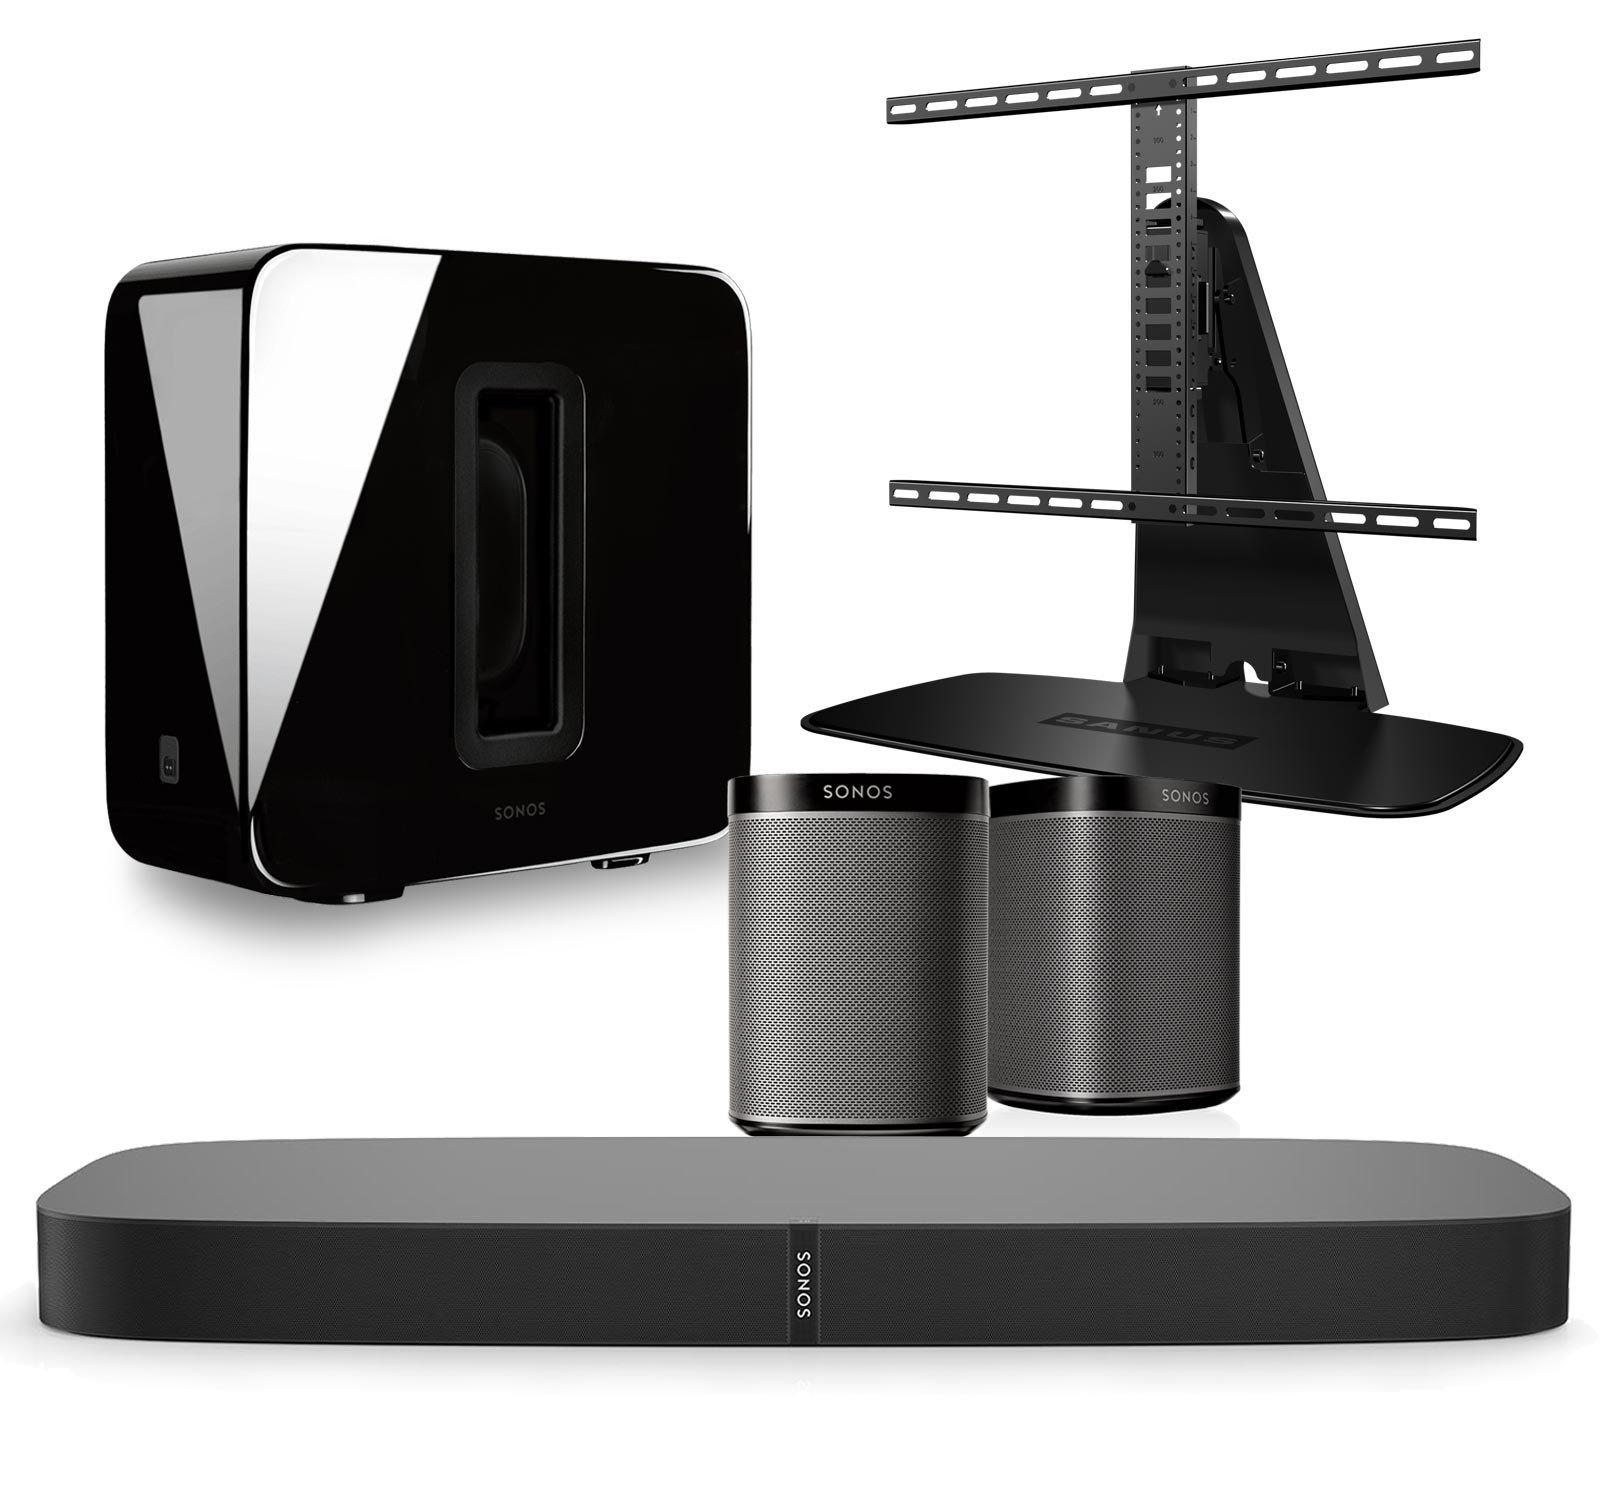 Sonos 5.1 Home Theater Digital Music System Bundle (PLAYBASE, SUB, PLAY:1) Black & Sanus WSTV1-B1 Swivel TV Base Mount for Sonos PLAYBASE